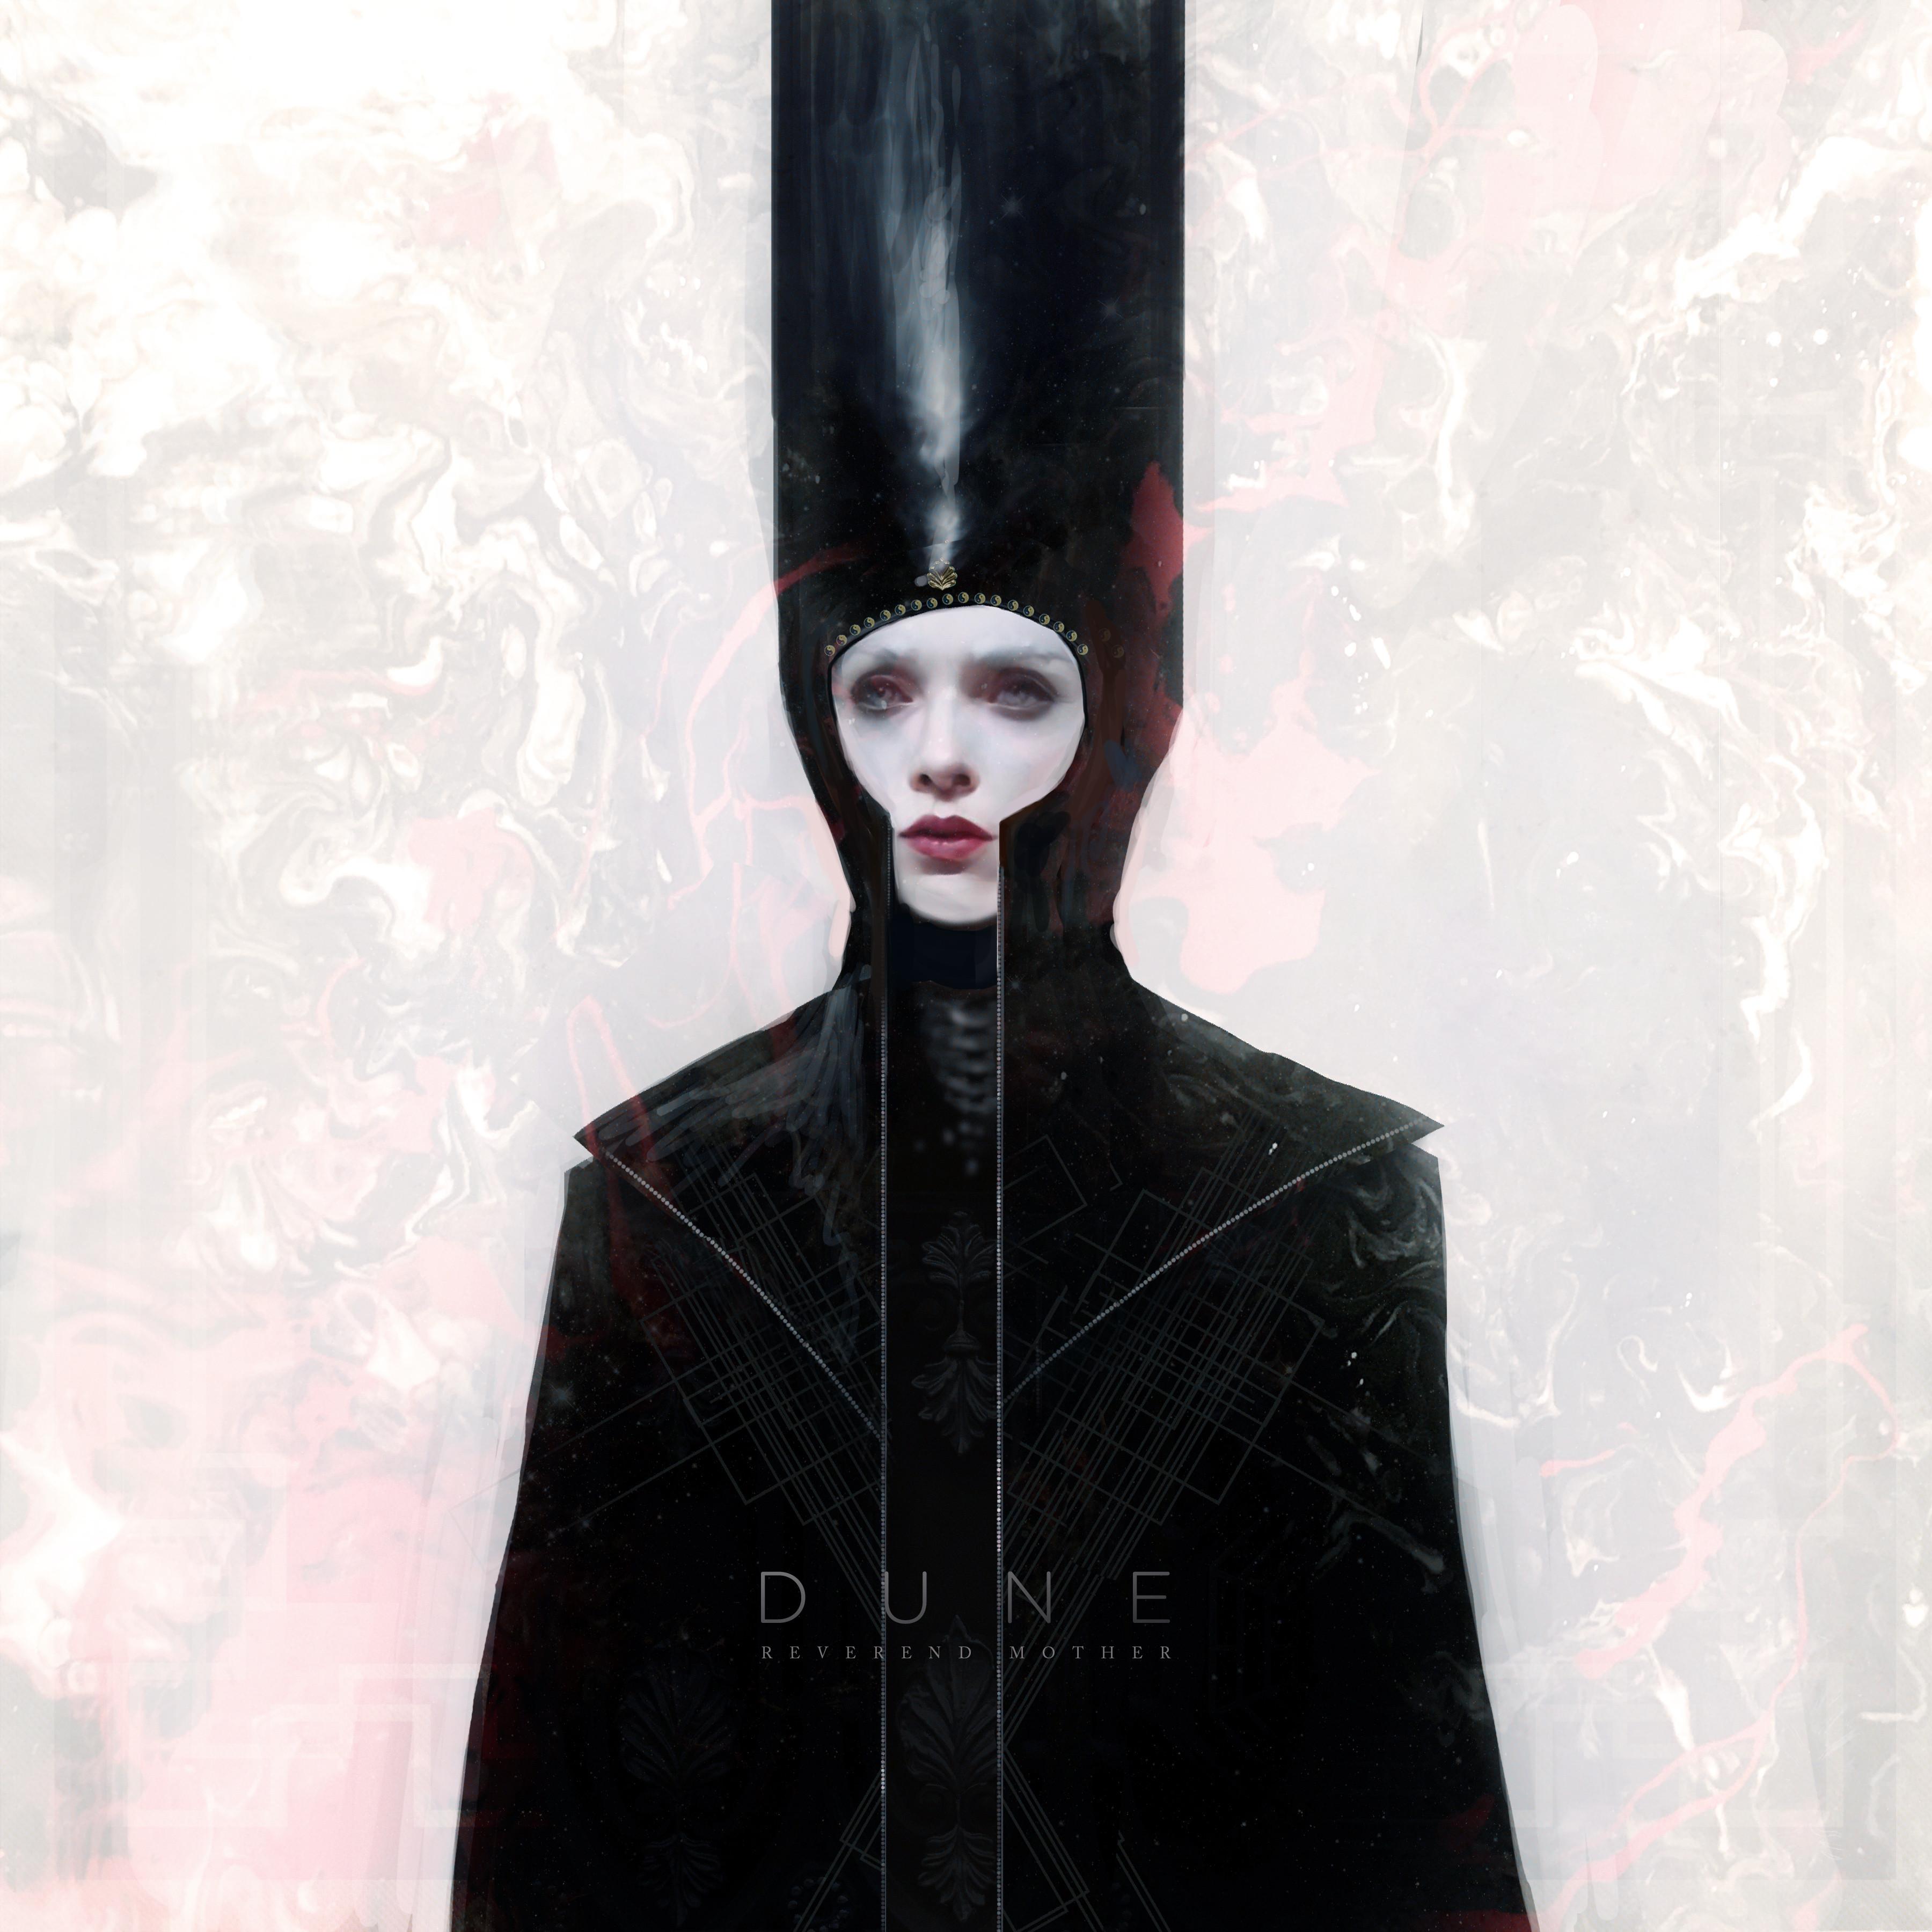 Premade Album Cover - Code: Reverend Mother